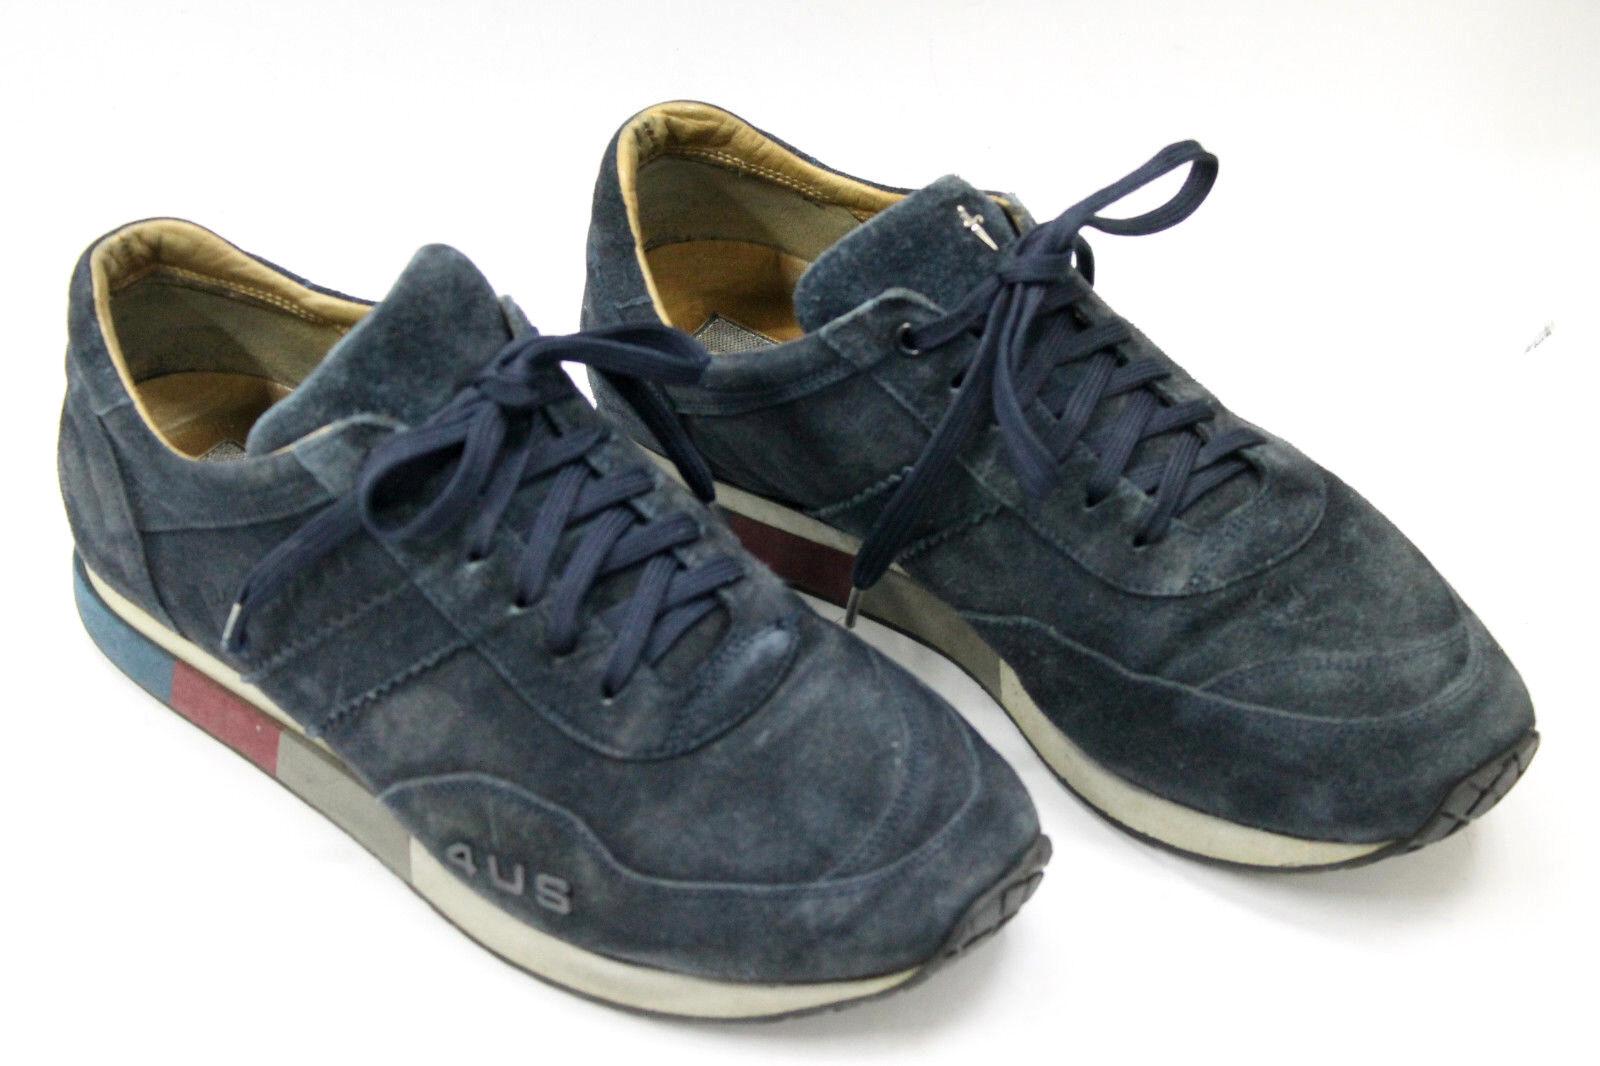 CESARE PACIOTTI Uomo shoes sz 7 Europe 41 blue suede S6928